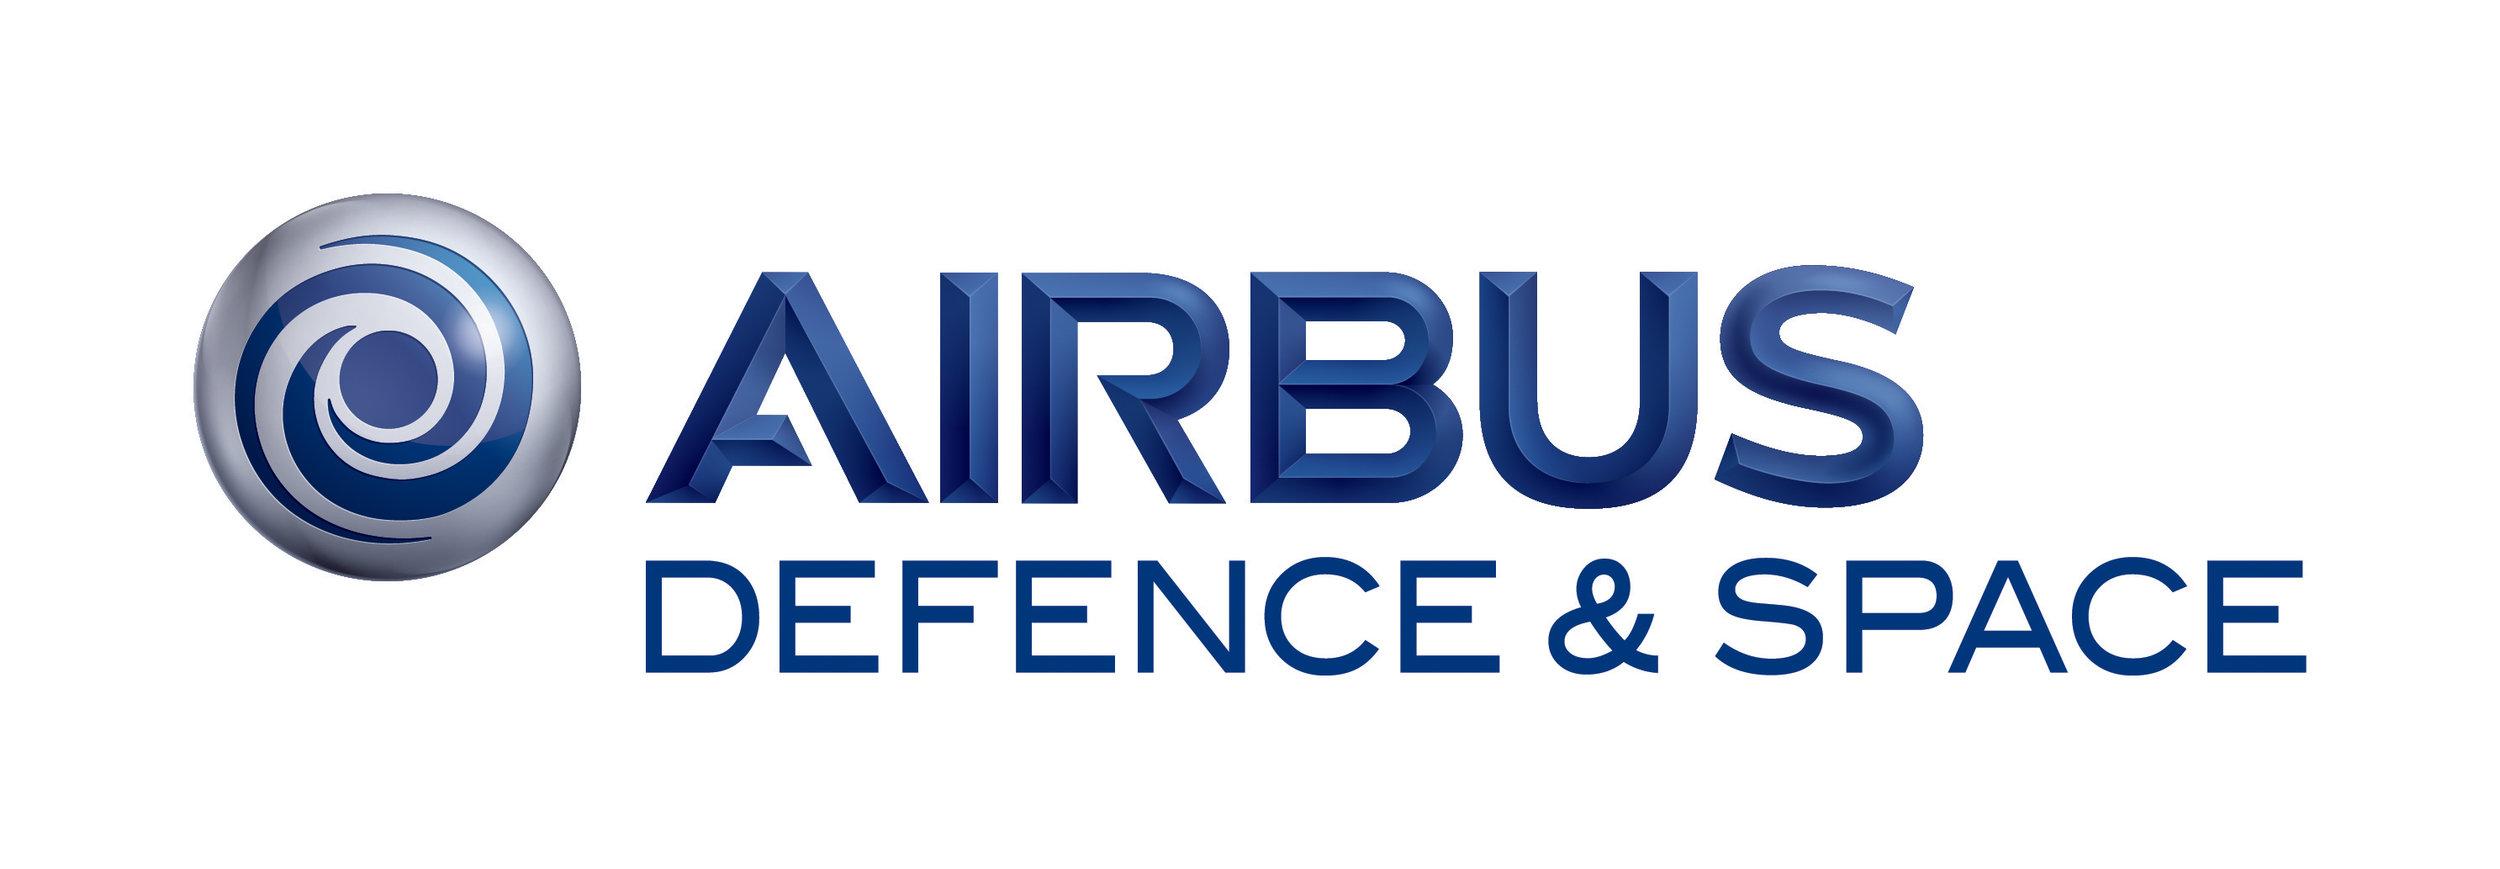 AIRBUS_DS_3D_Blue_RGB.jpg